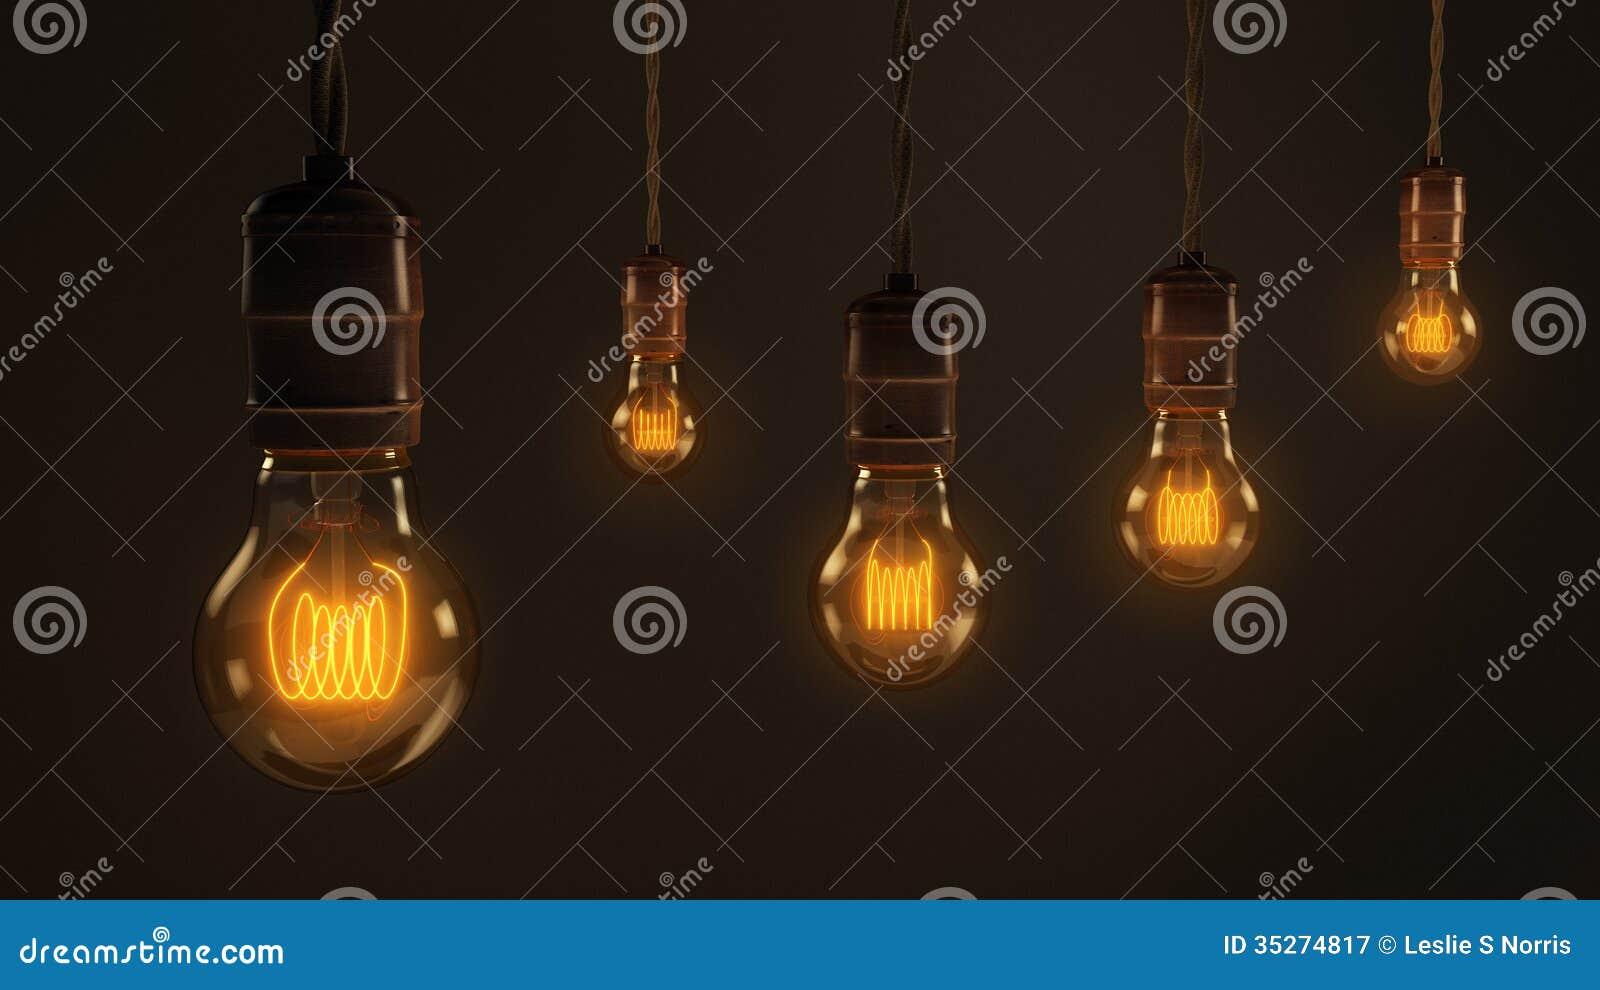 royaltyfree stock photo - Vintage Light Bulbs